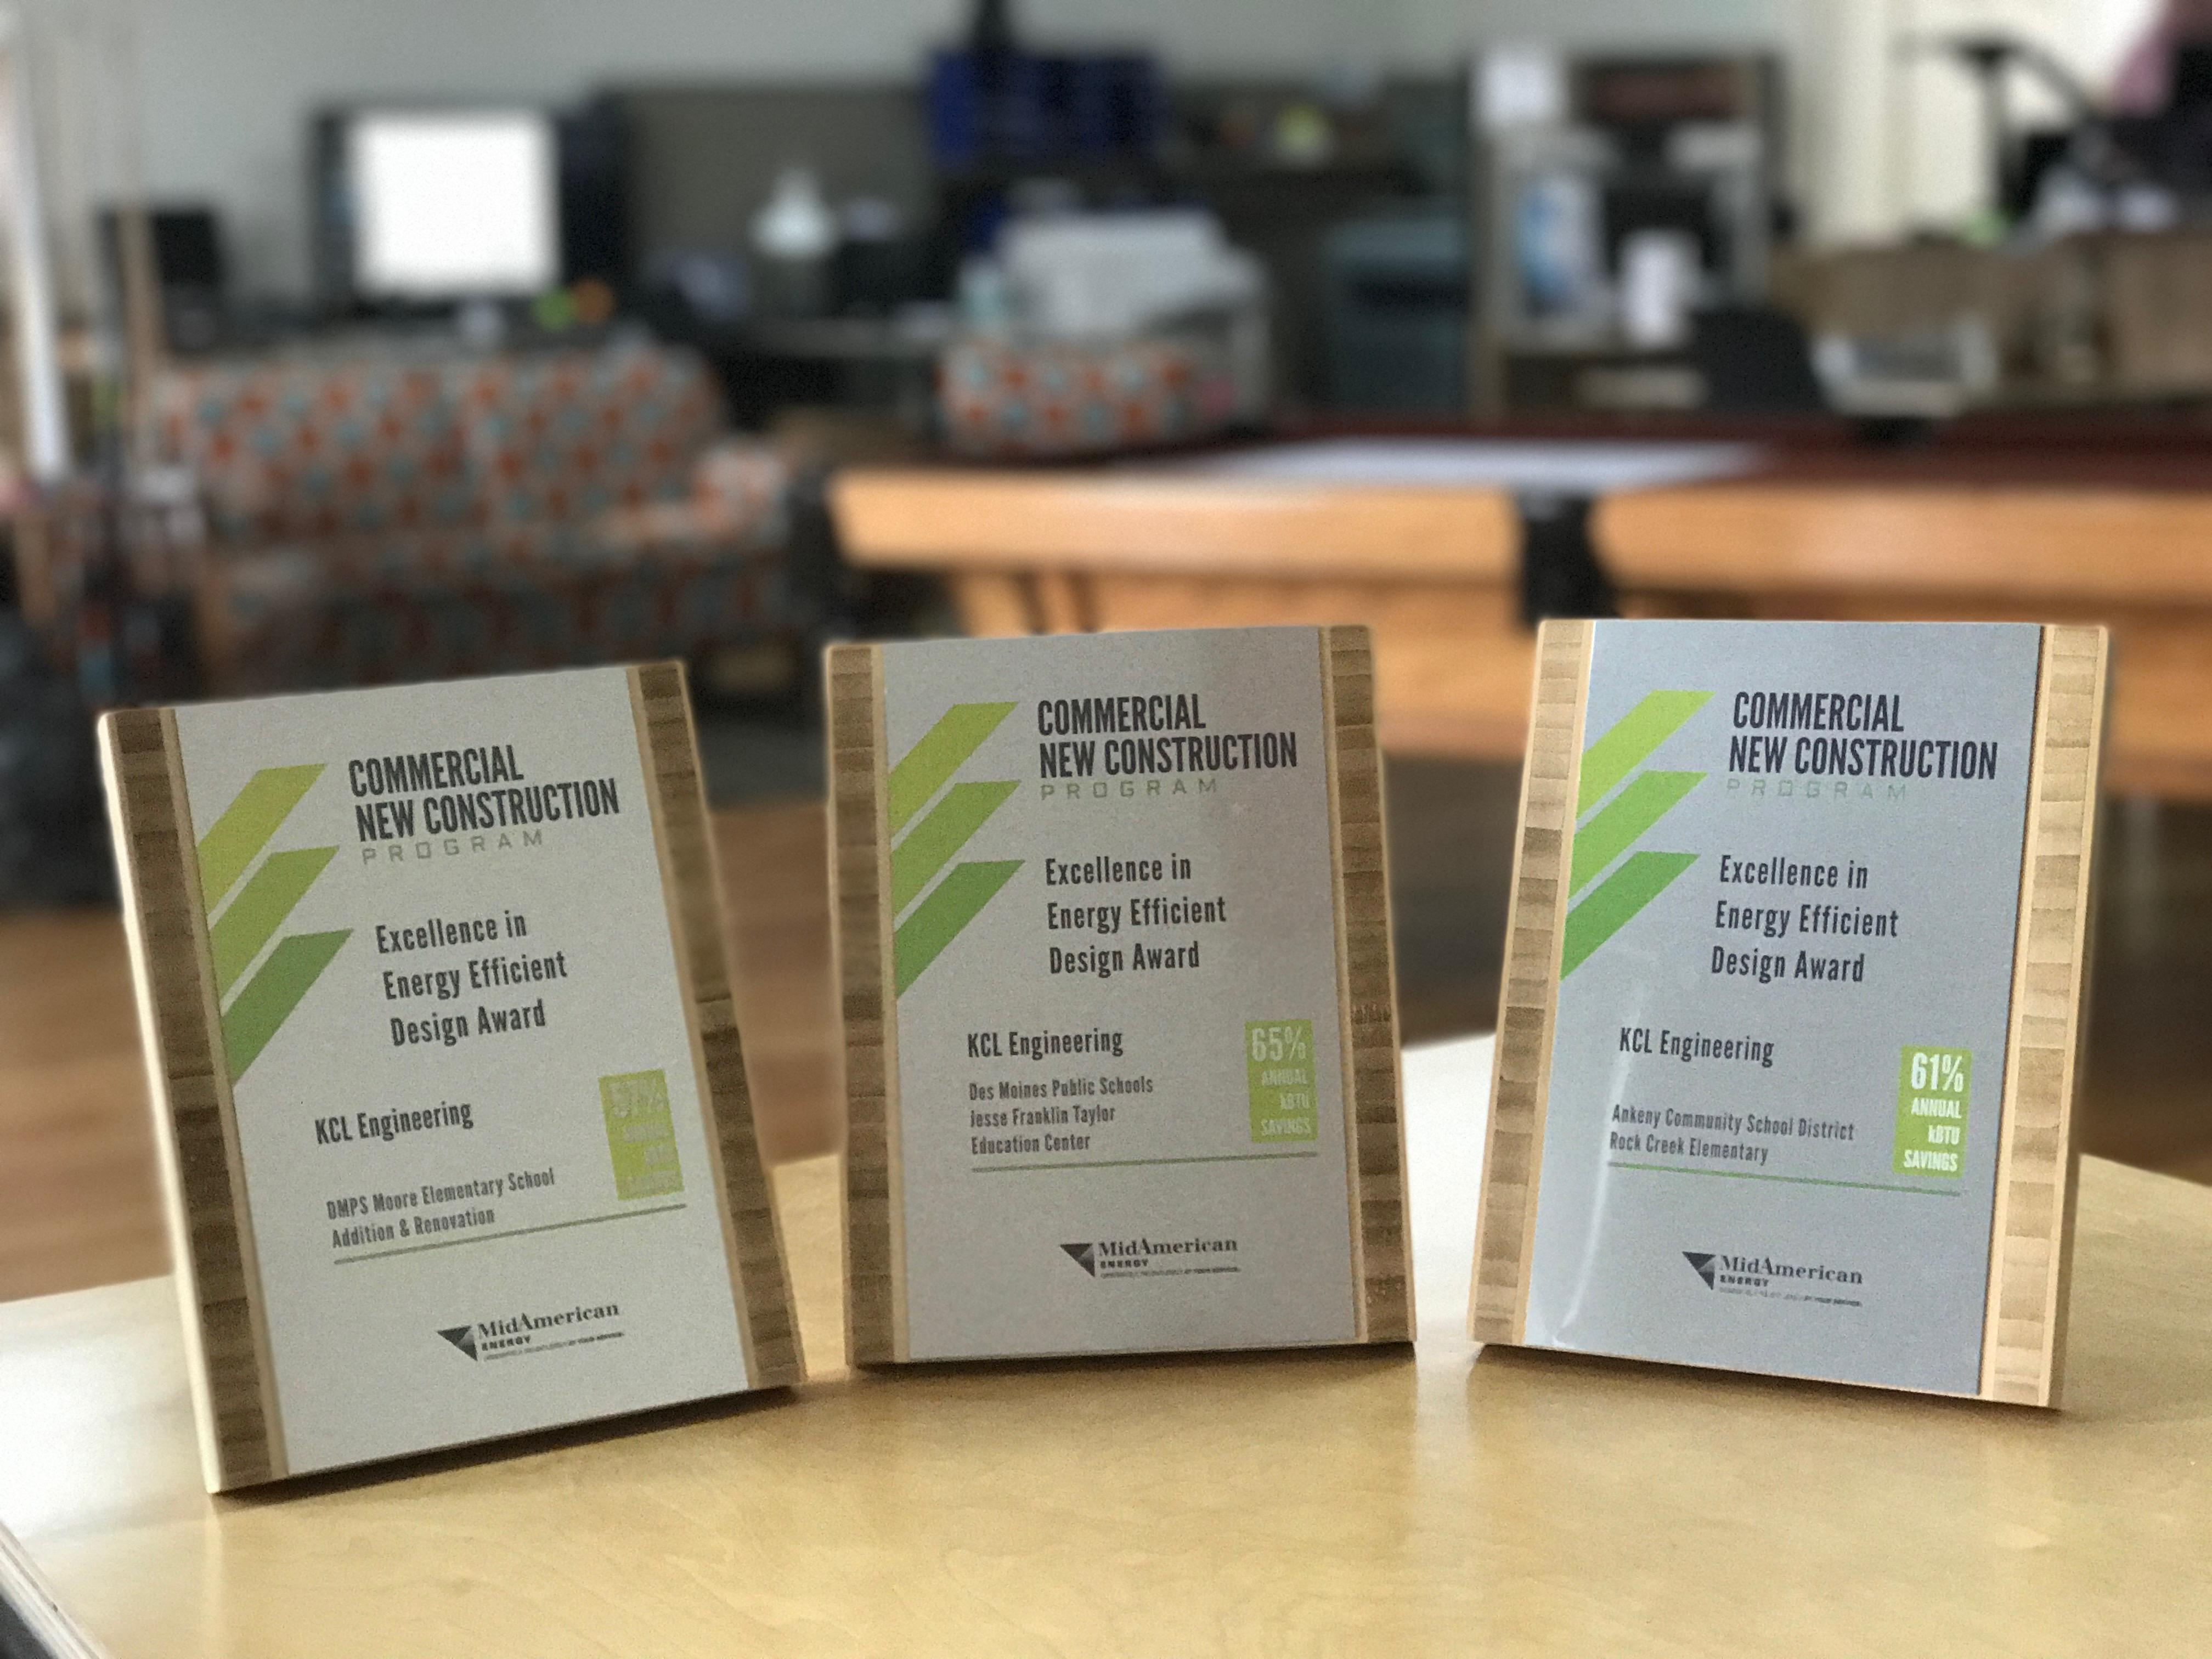 DMPS MidAmerican Energy Awards